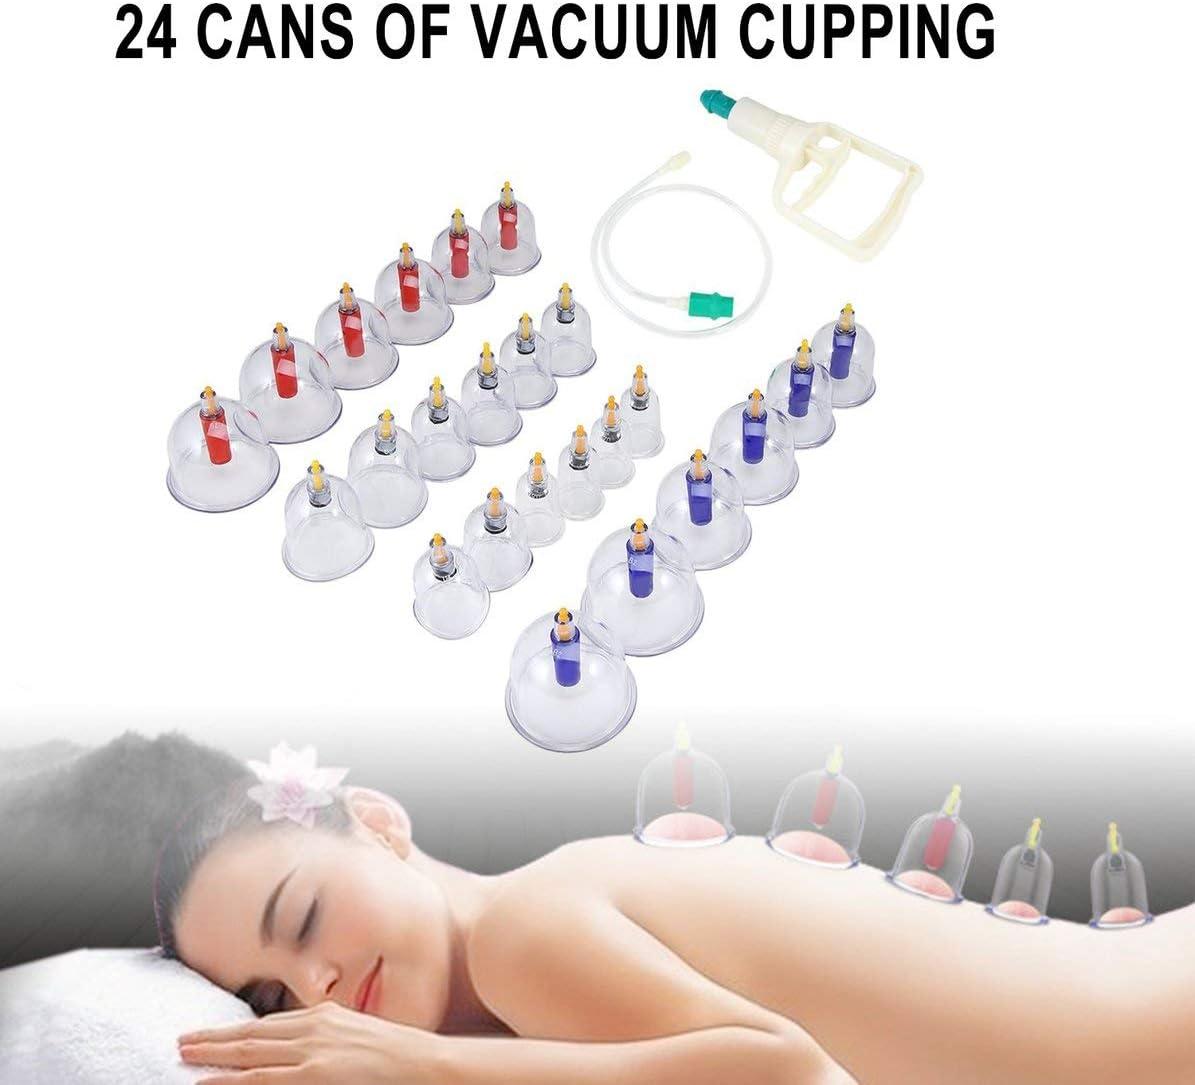 Claro Sunnyflowk Chinese Health Care Medical Vacuum Body Cupping Set 24Pcs Latas de Masaje Taza Biomagn/ética Terapia de Masaje Kit de relajaci/ón Corporal